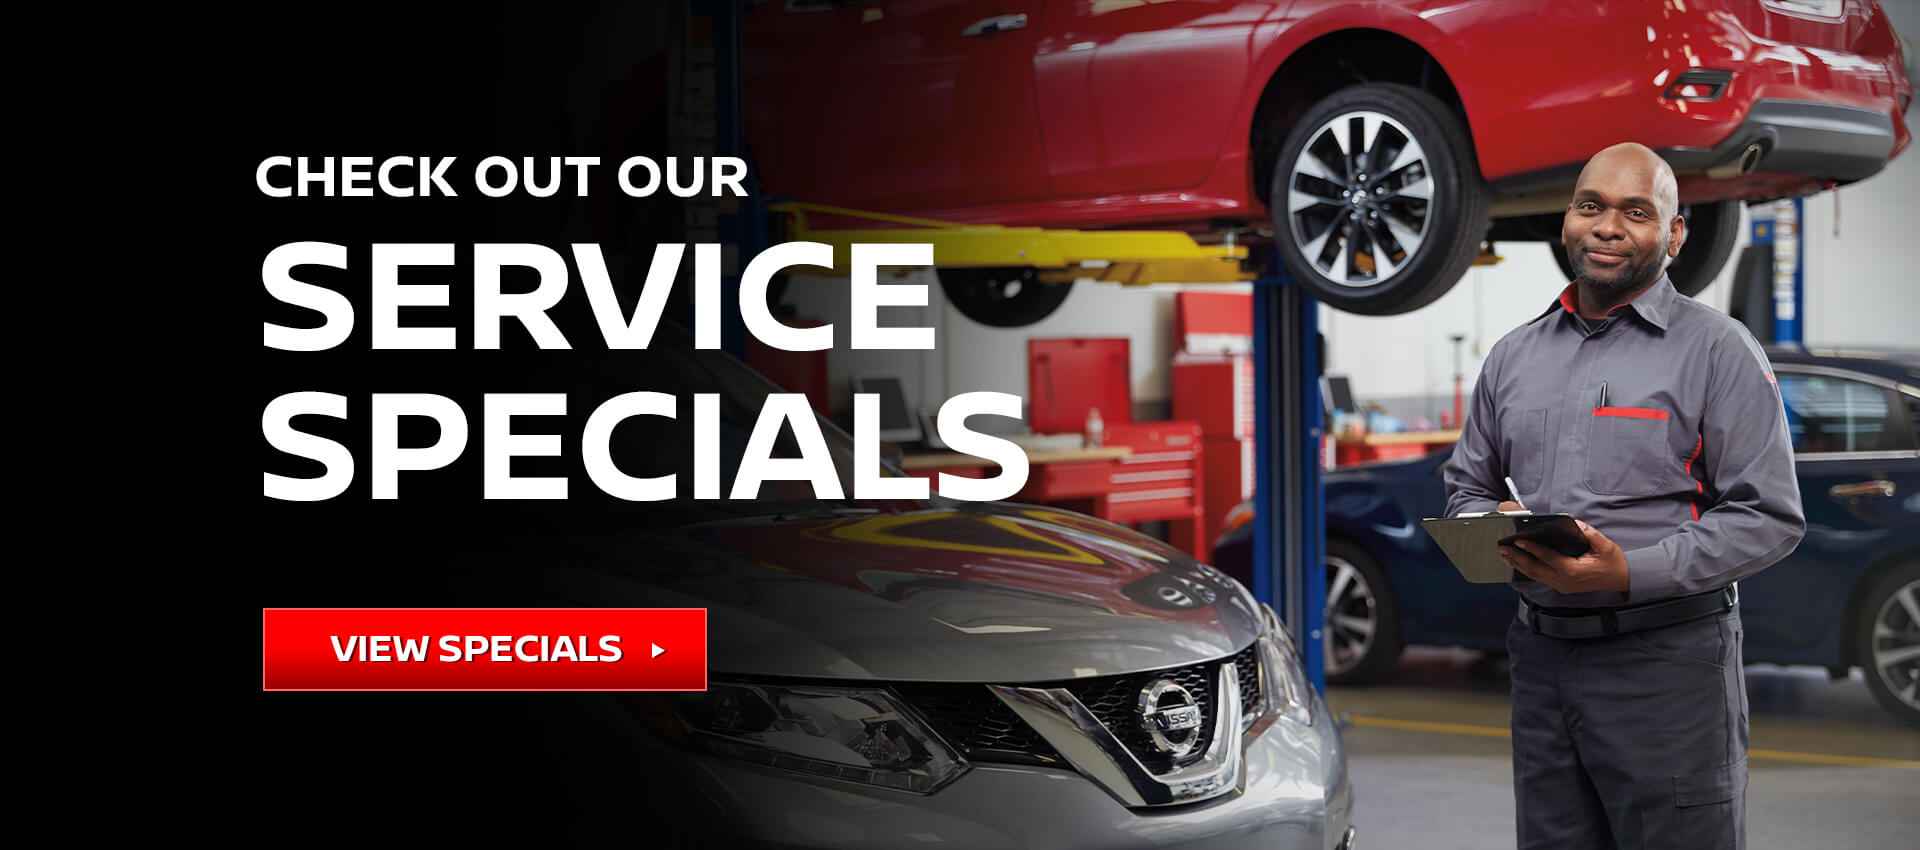 Generic Service Specials